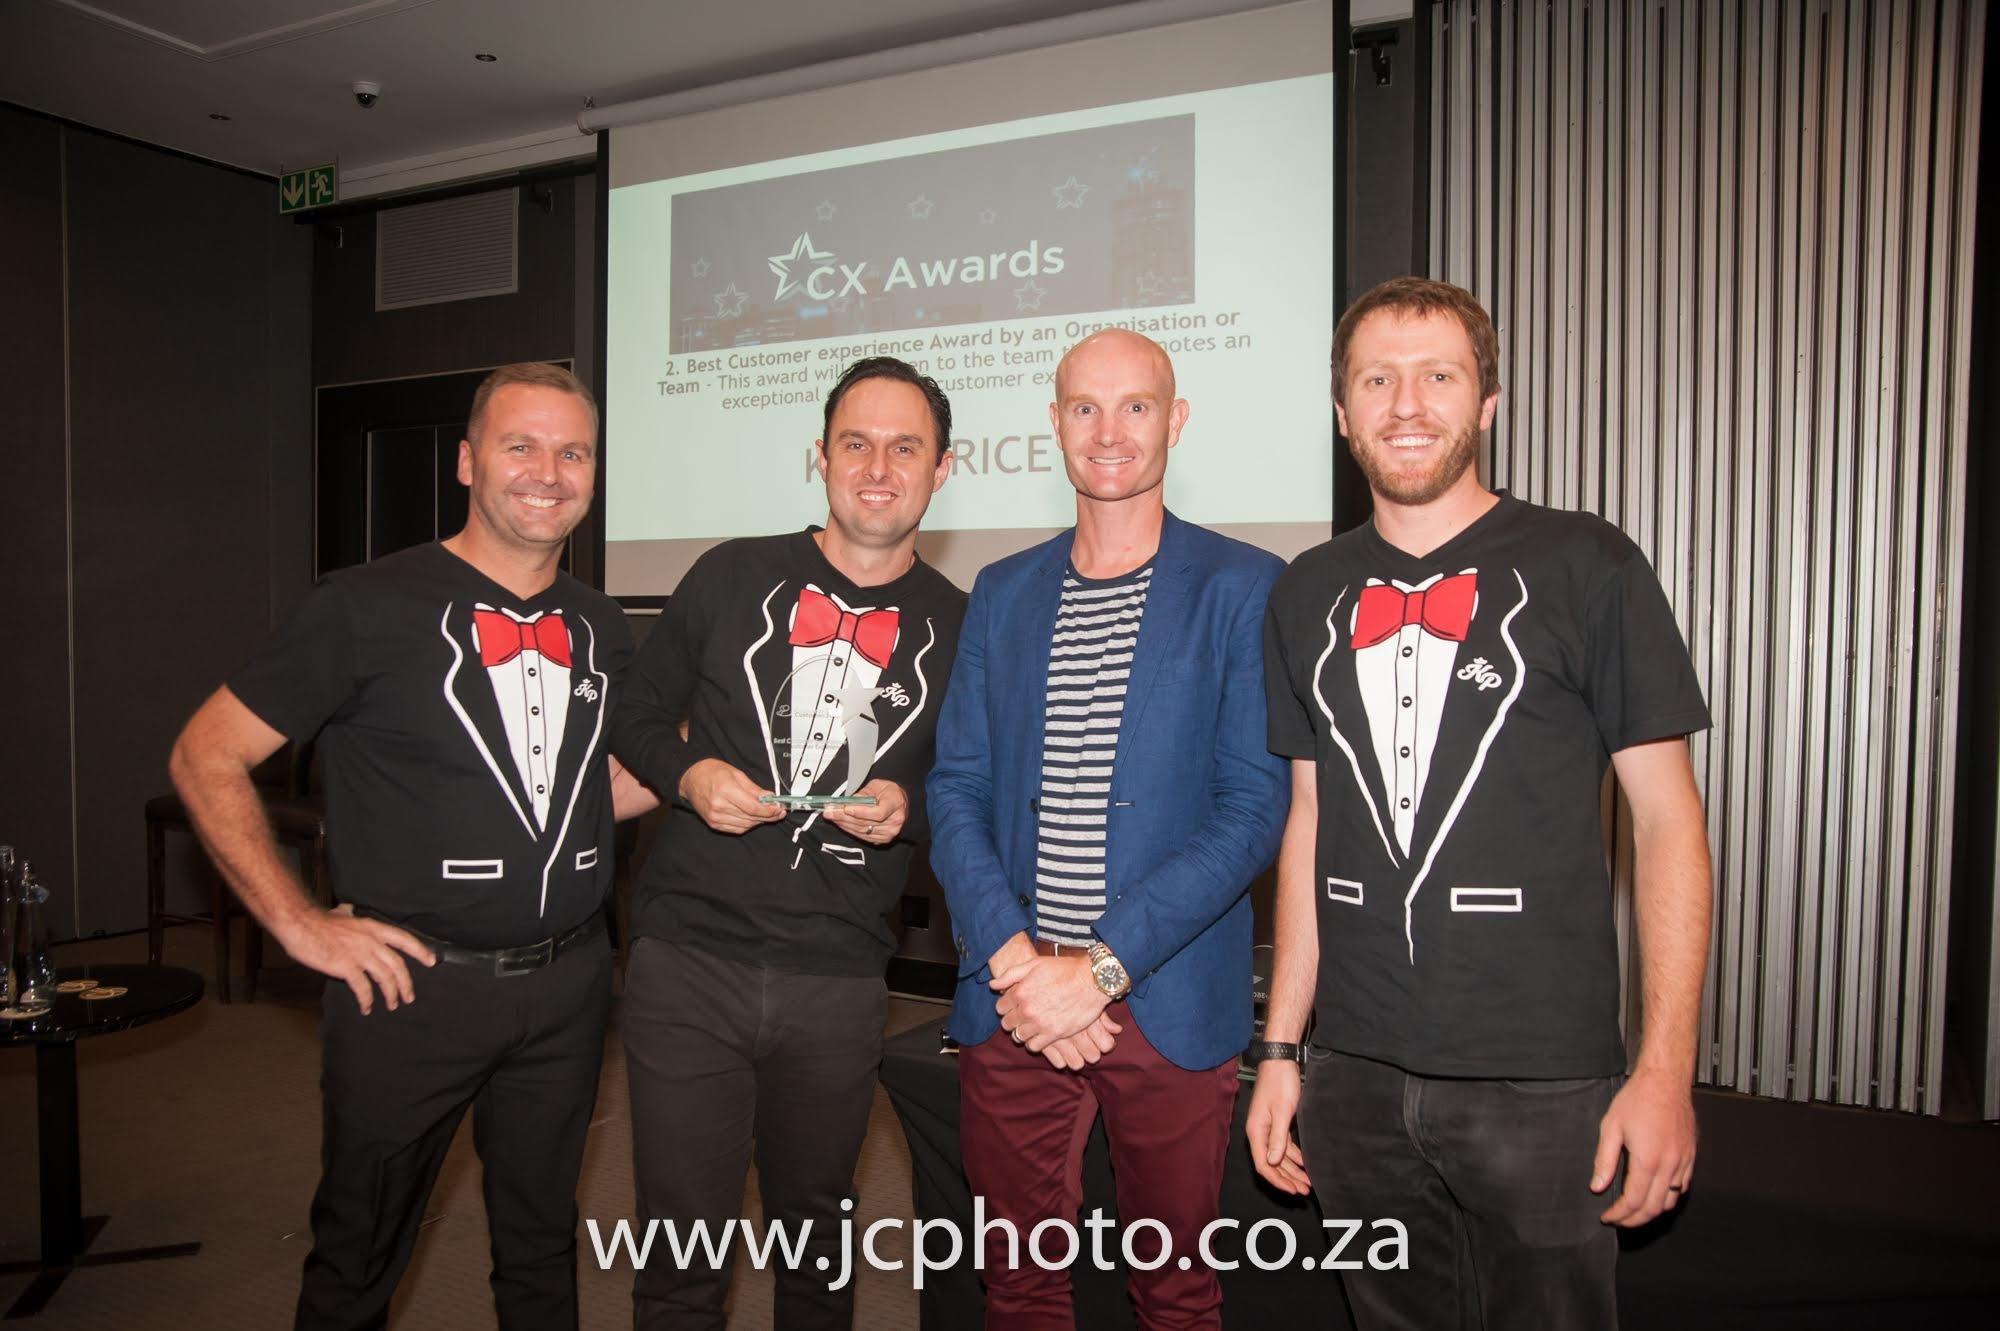 c360 awards3